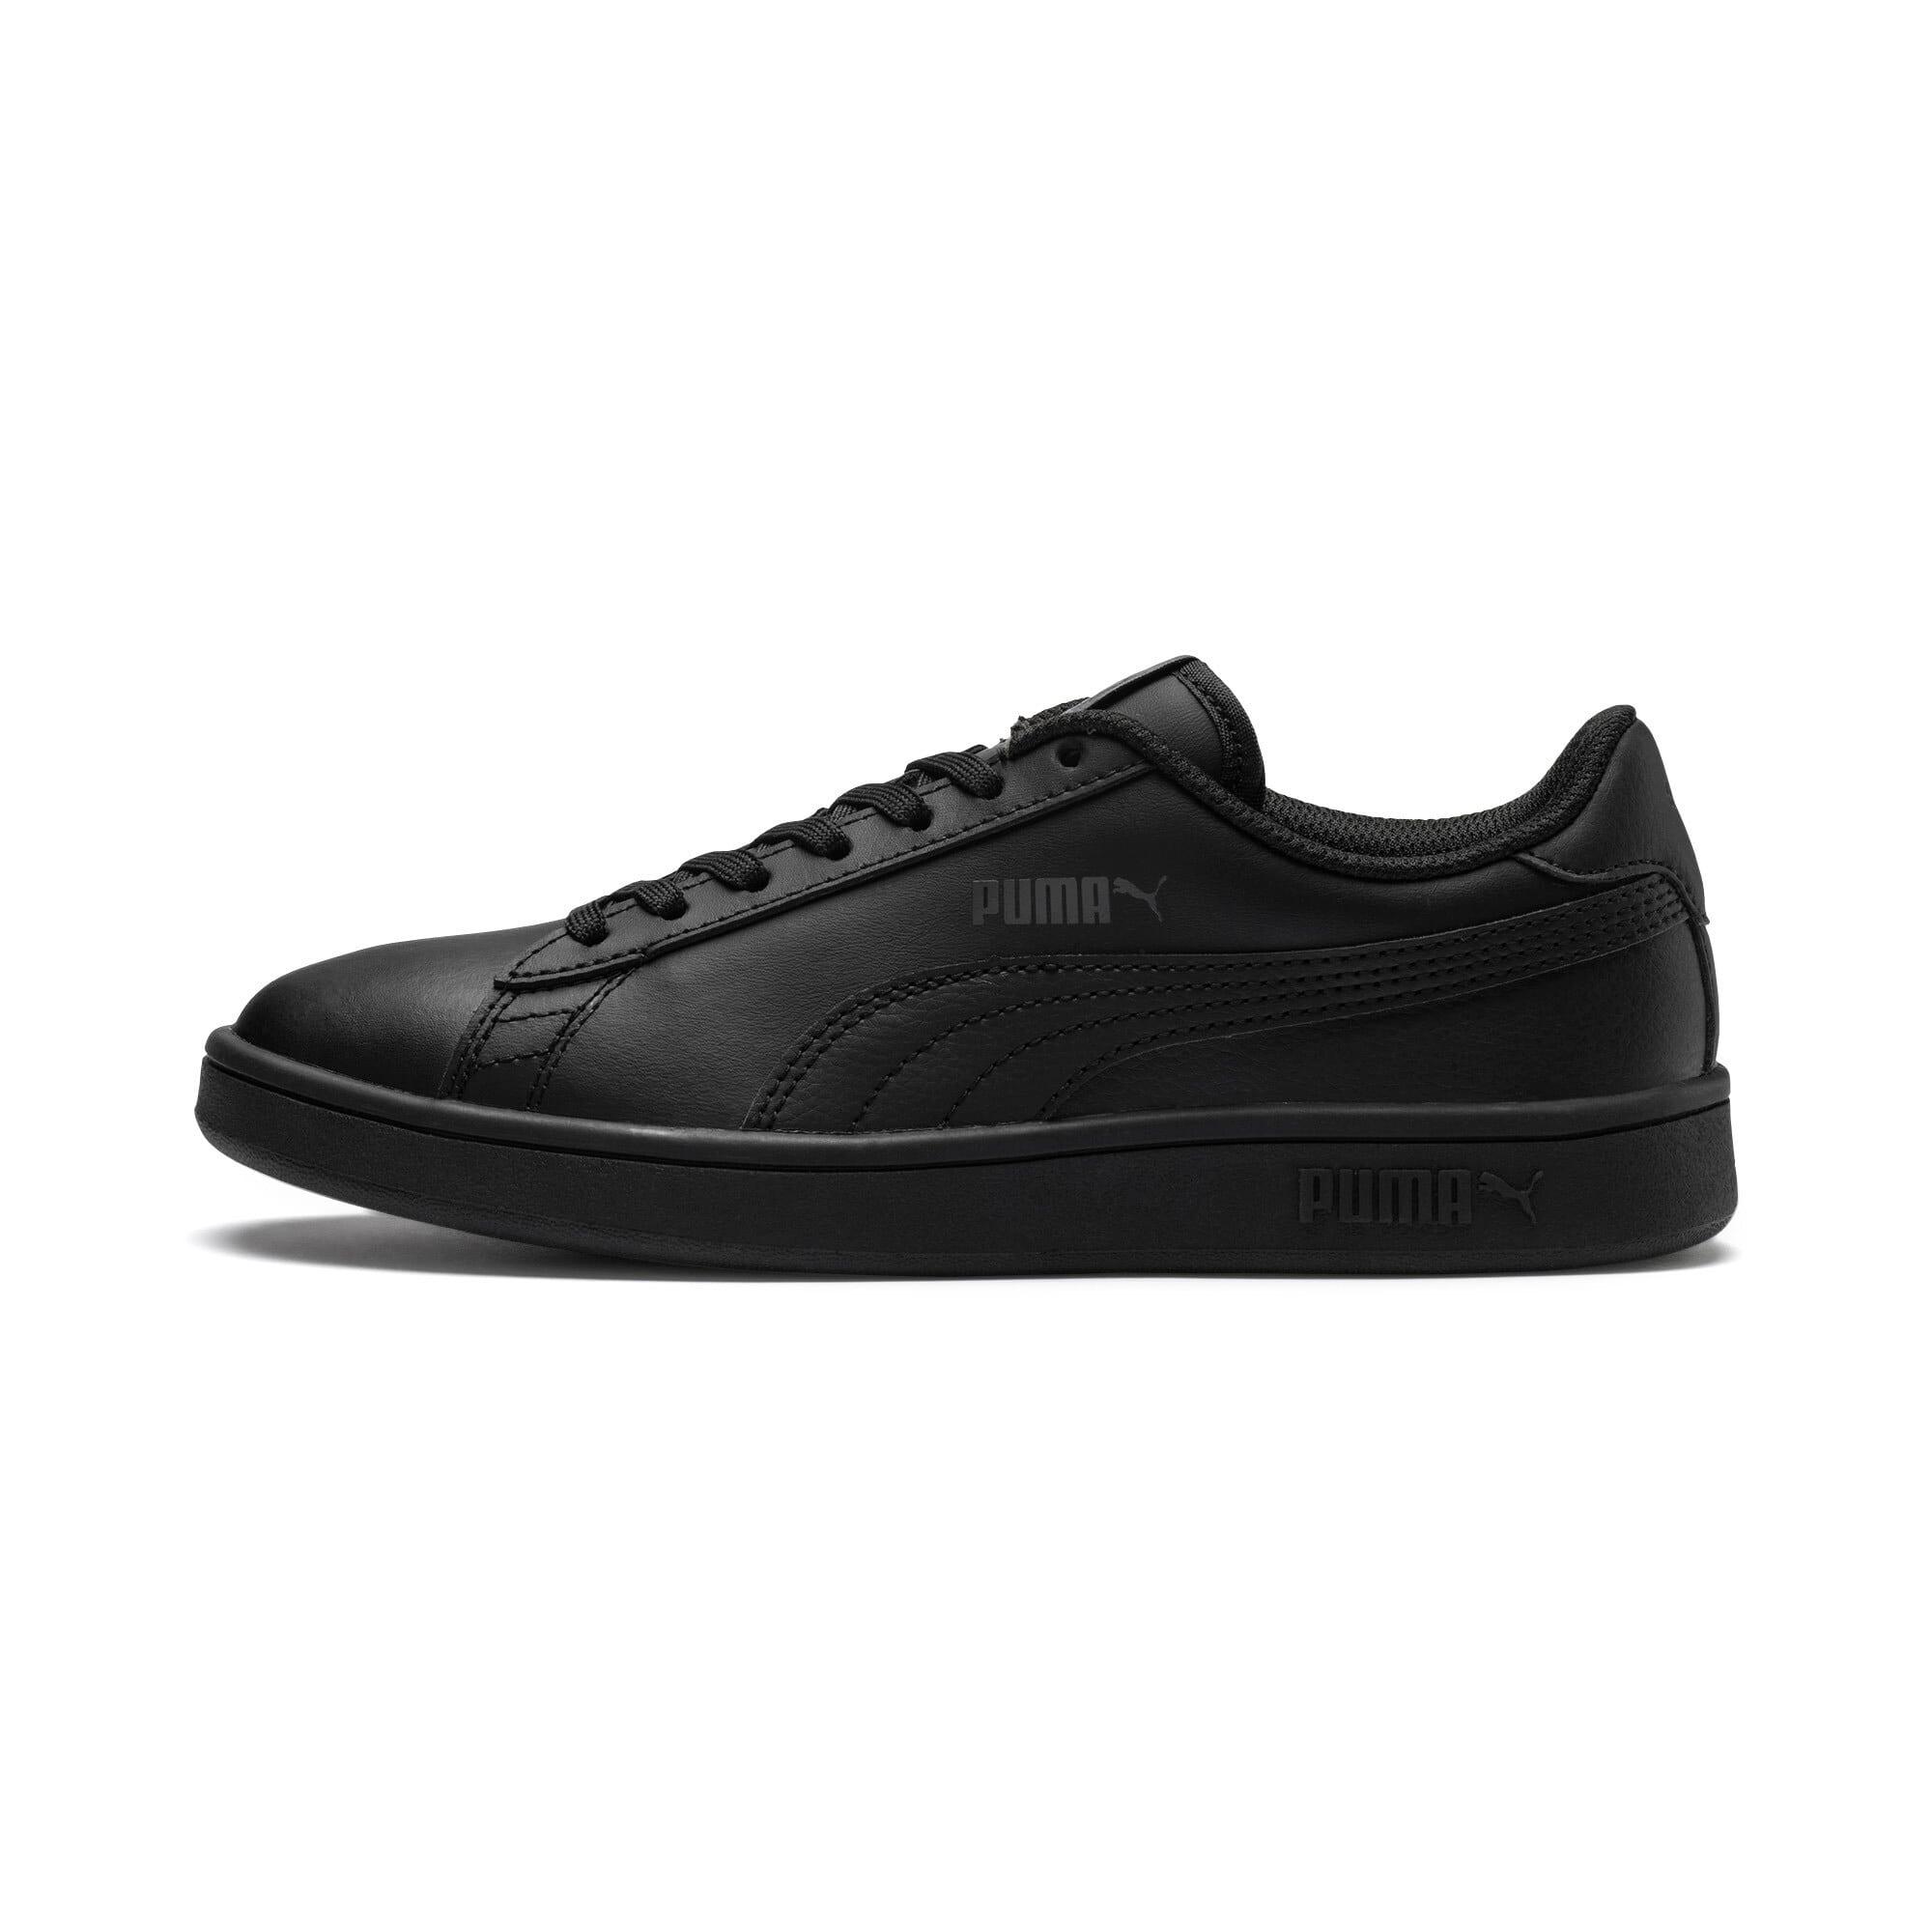 Thumbnail 1 of PUMA Smash v2 Leather Sneakers JR, Puma Black-Puma Black, medium